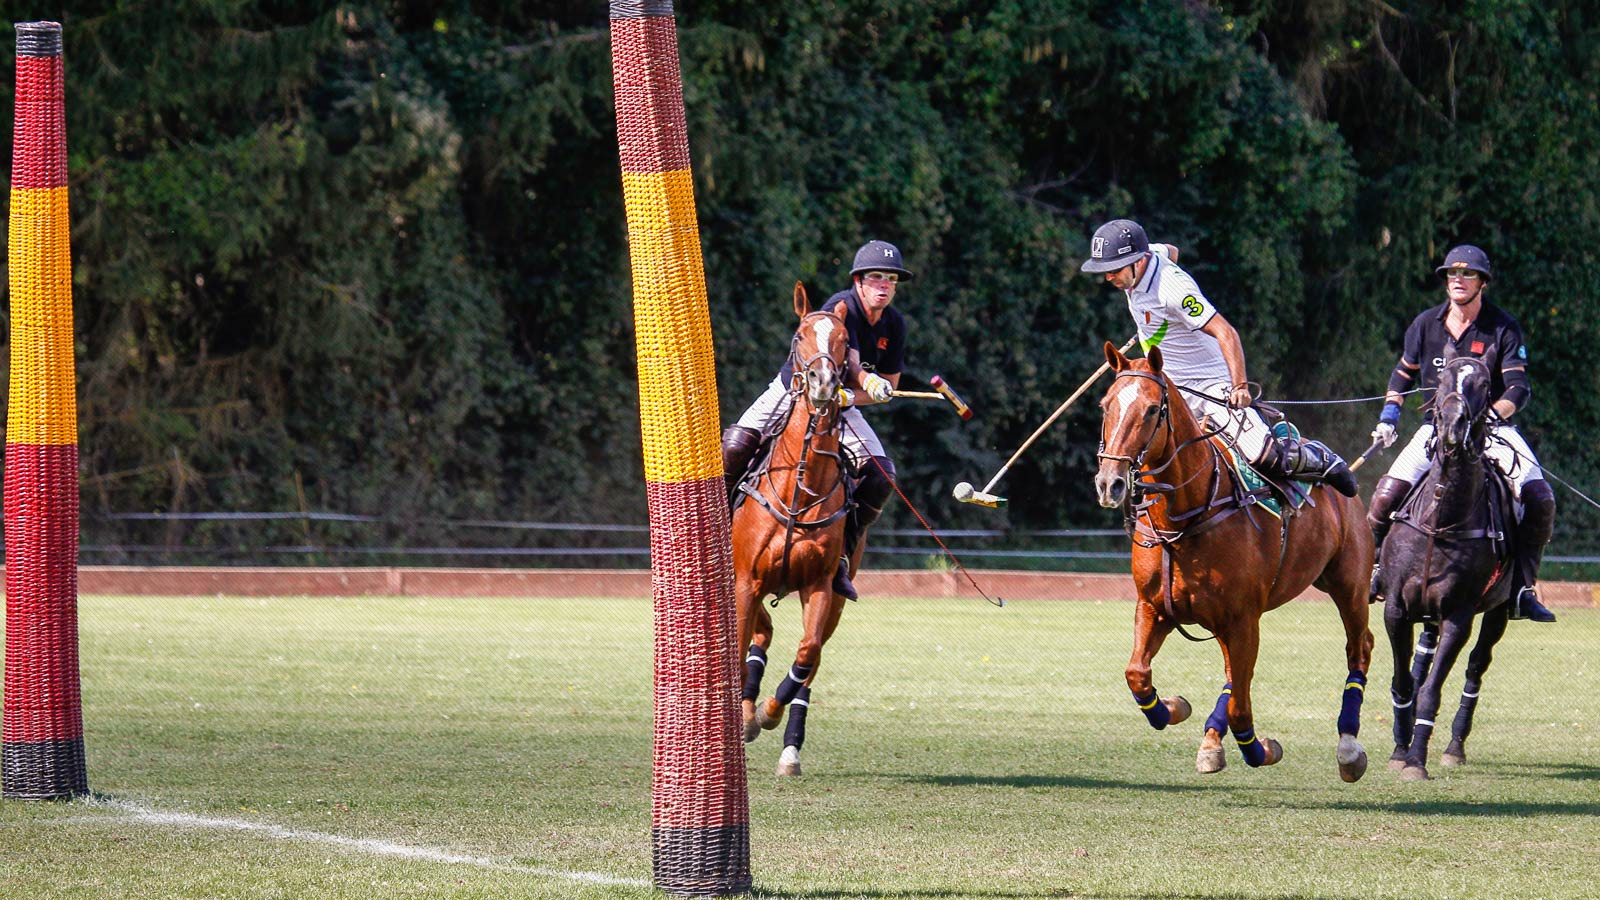 jugadores de polo en acción